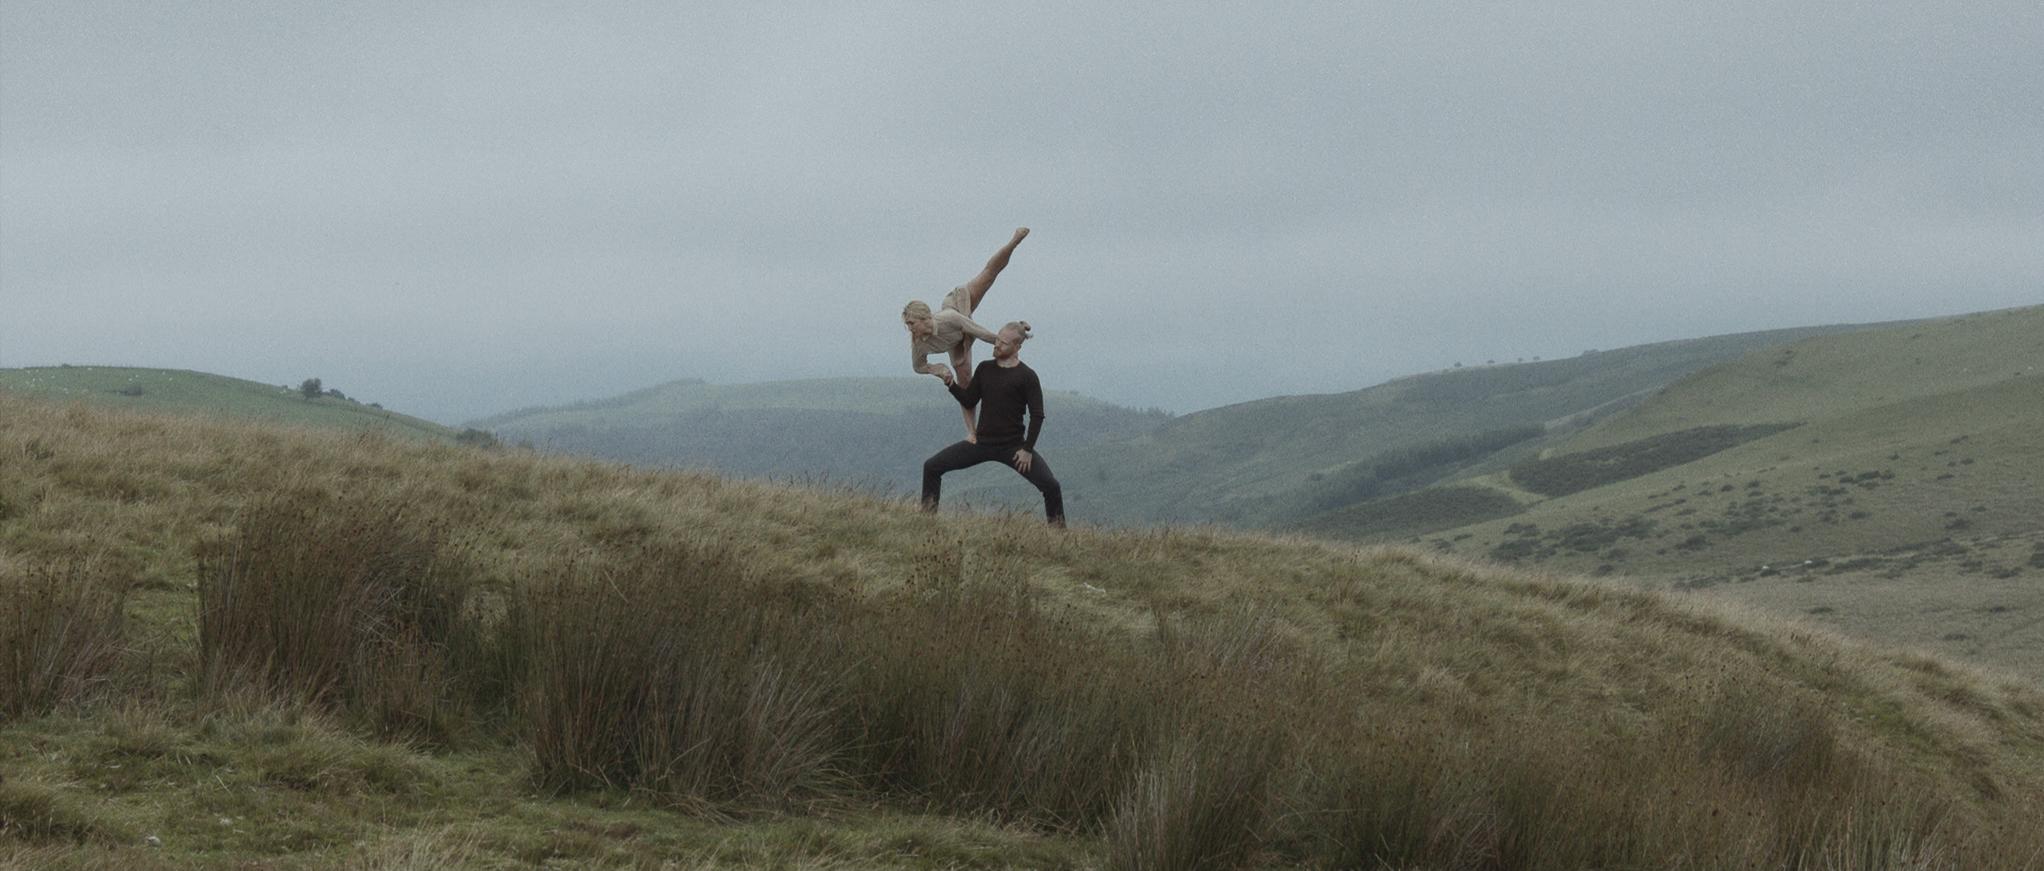 Lovesick: Dancing in the Dusk